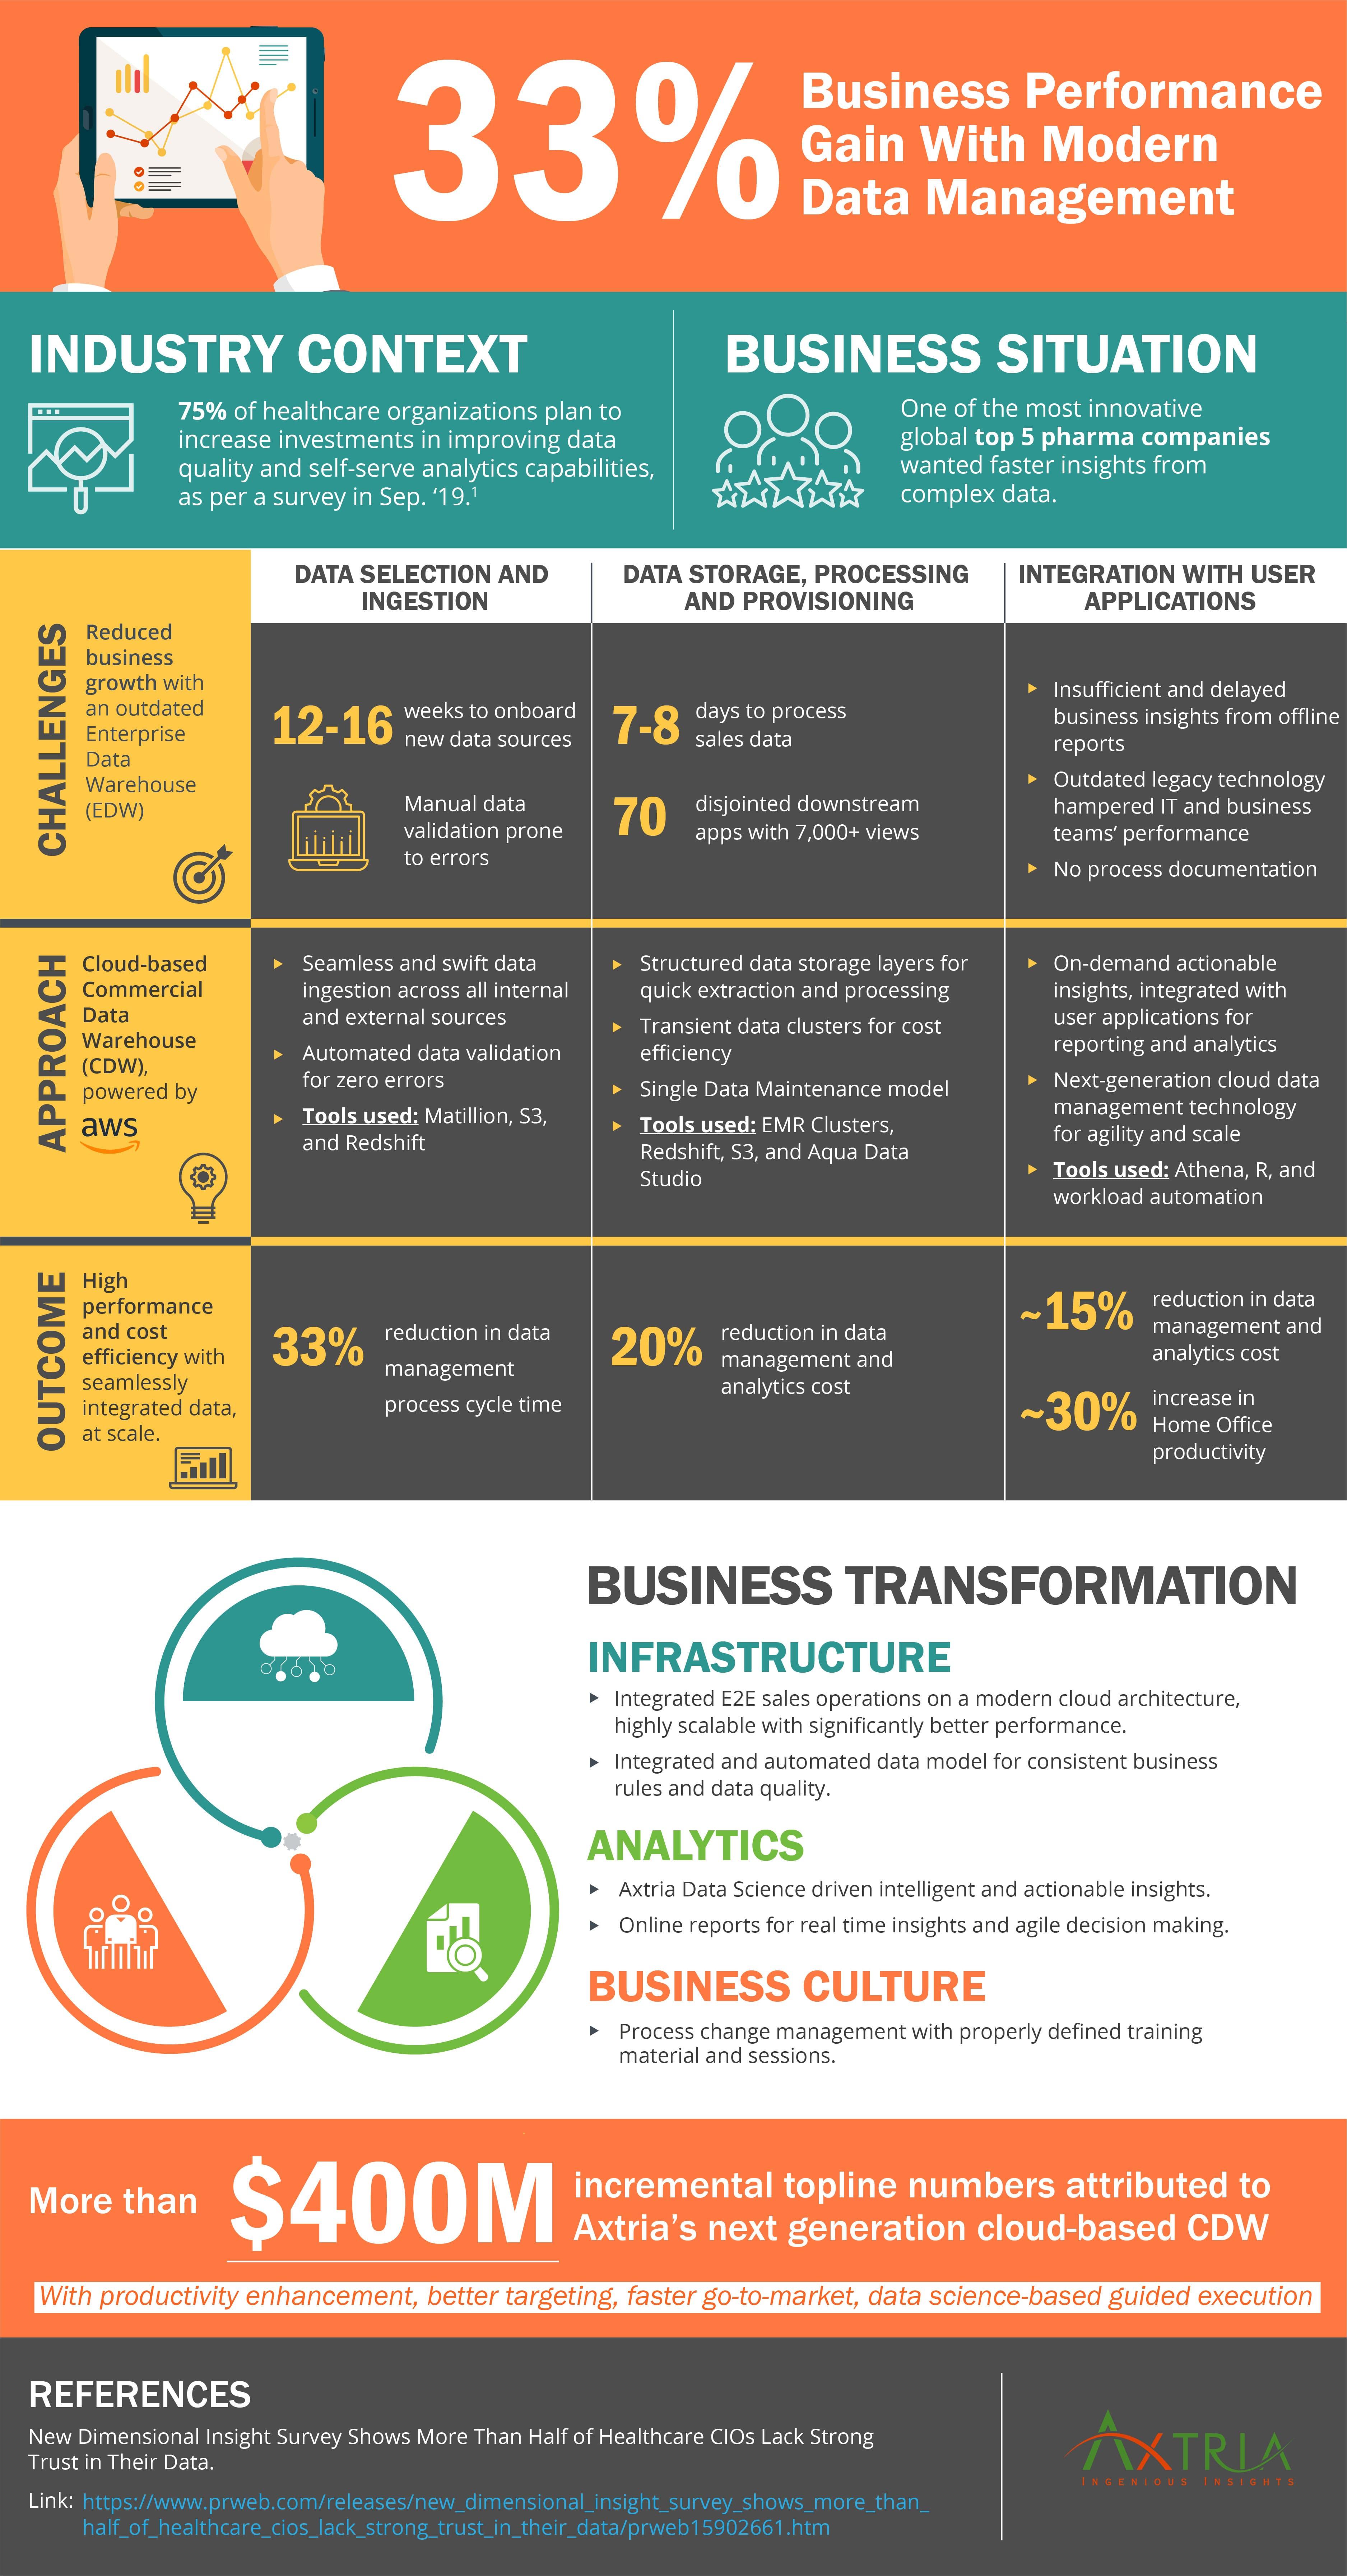 Modren data managment - Infographic